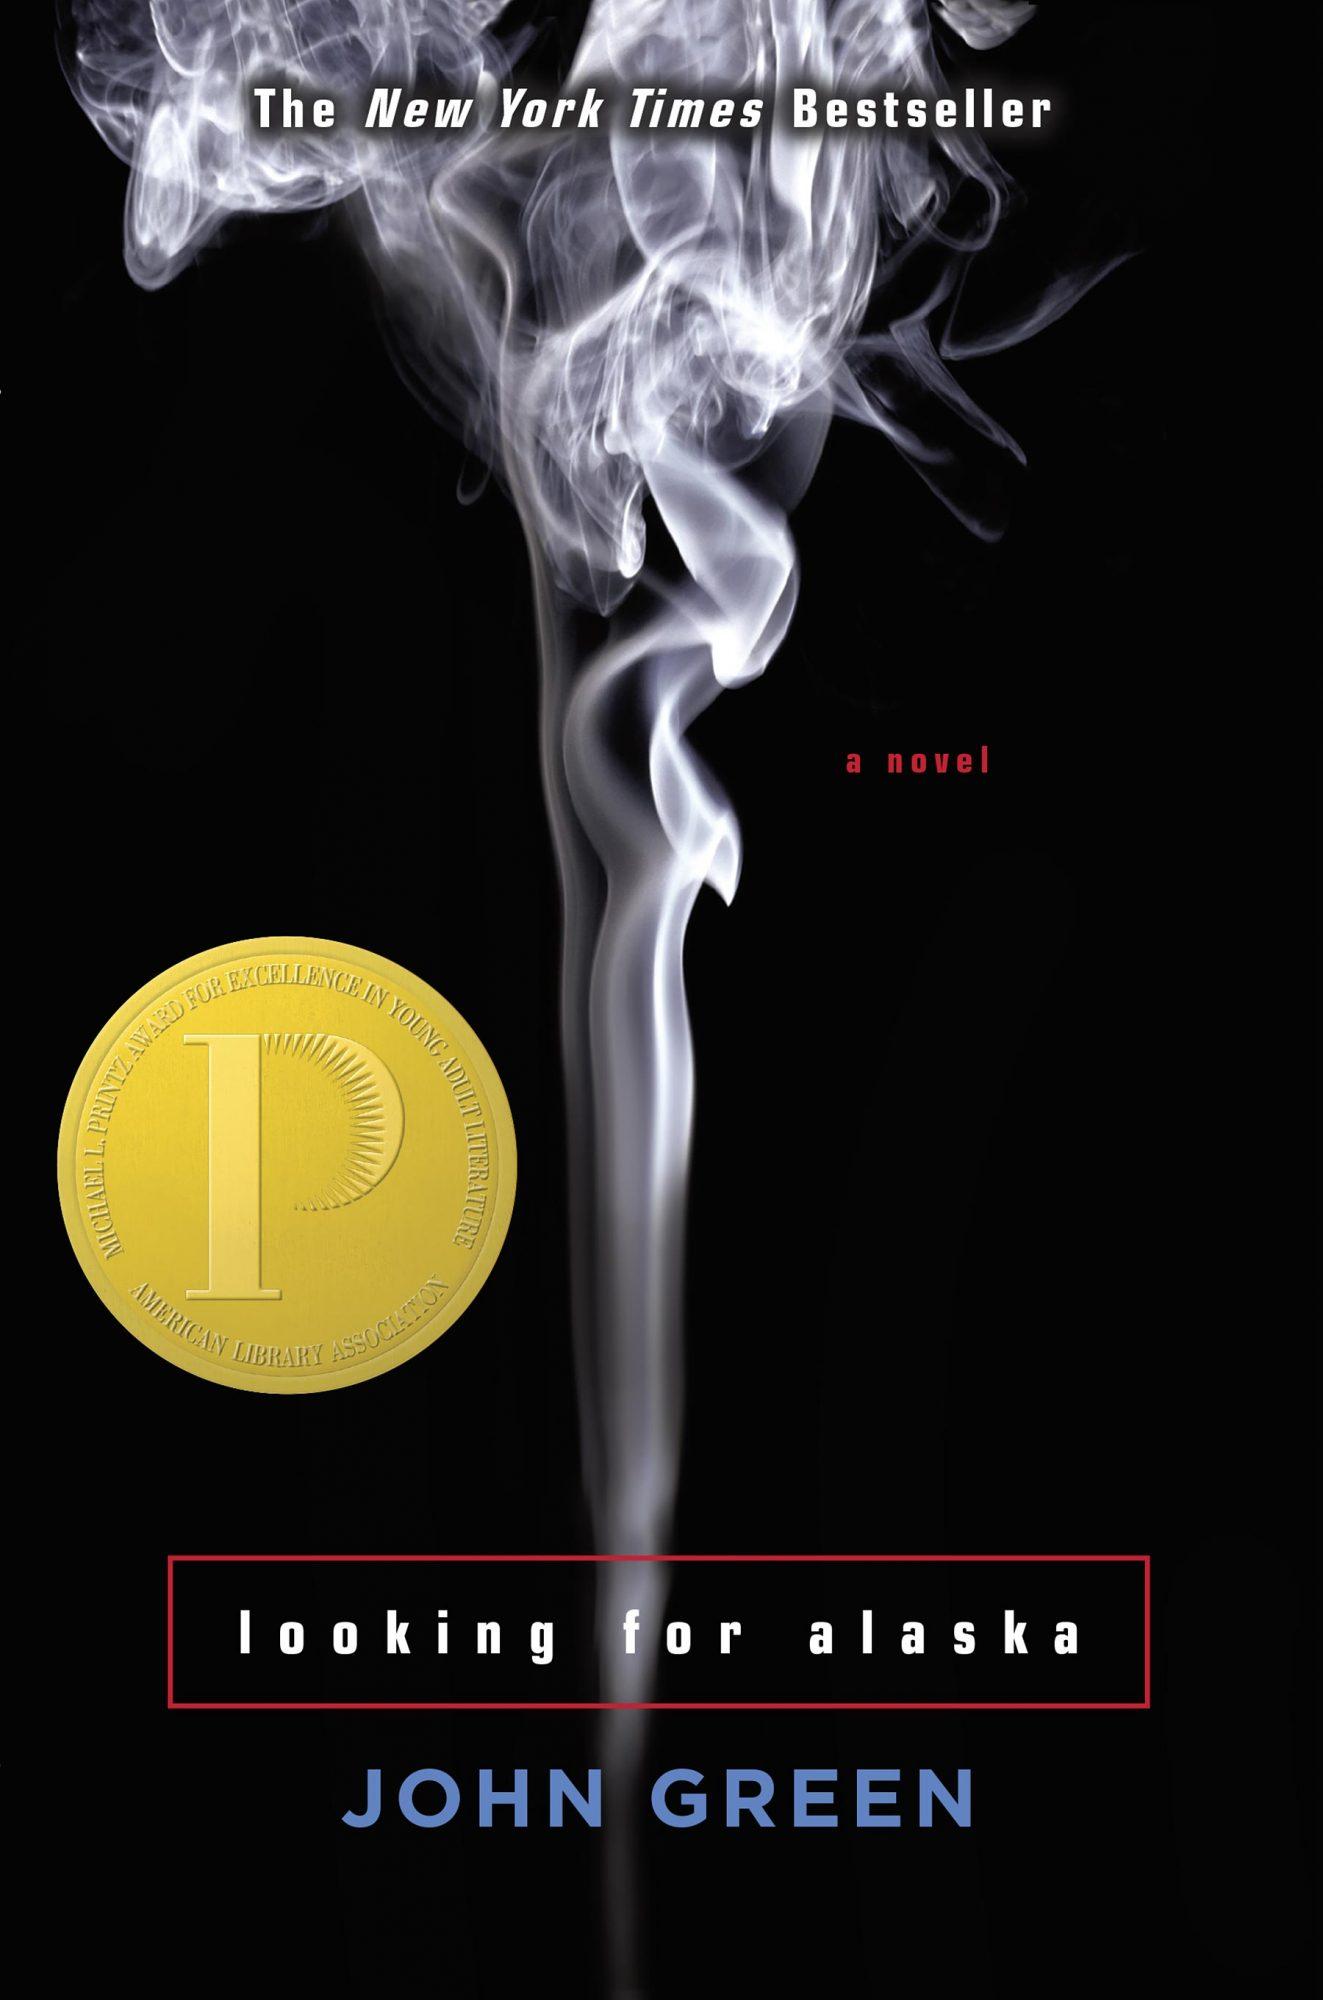 Looking for Alaska by John Green CR: Penguin